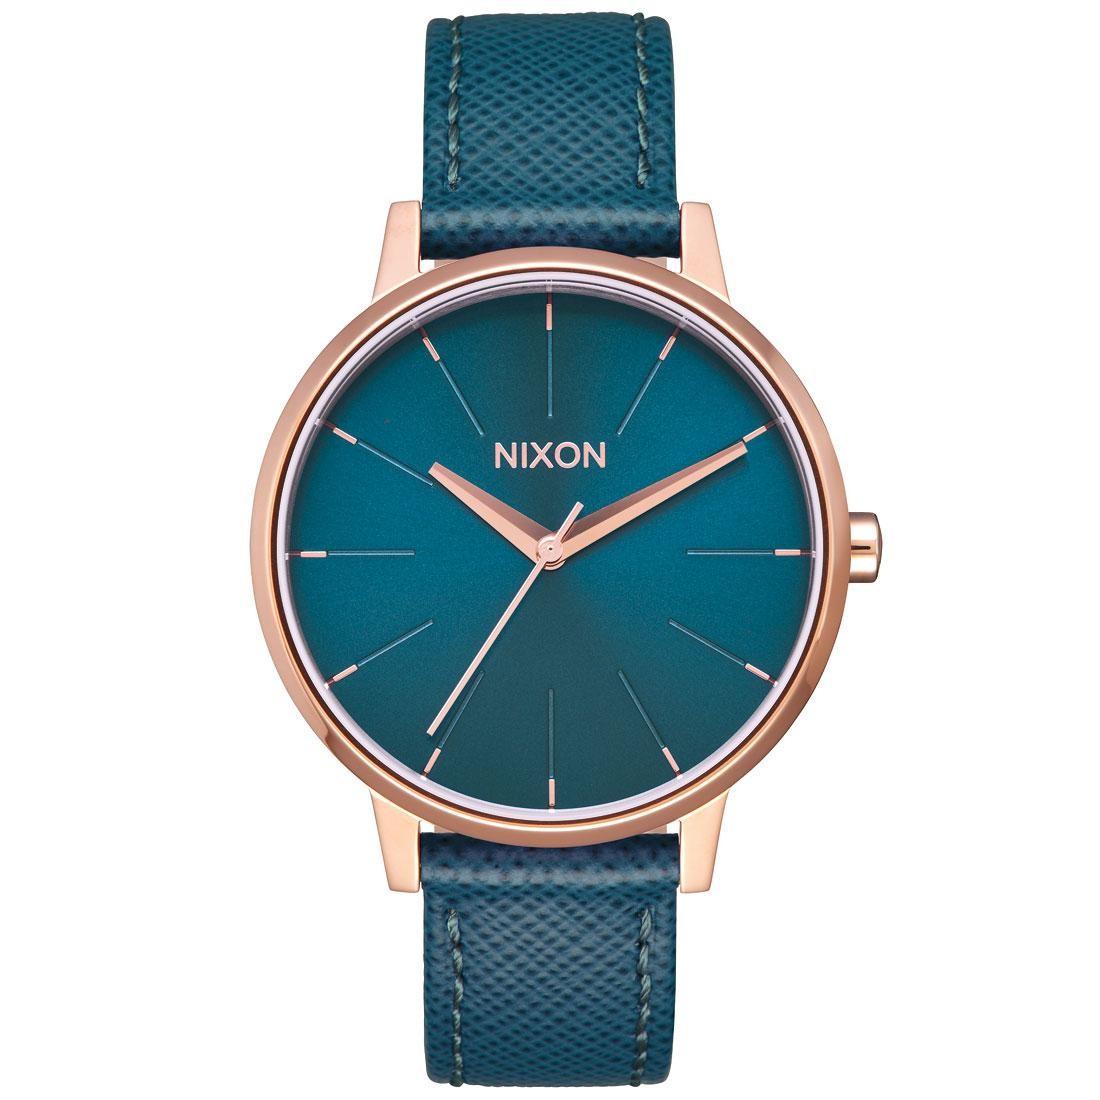 Nixon Kensington Leather Watch (gold / rose gold)